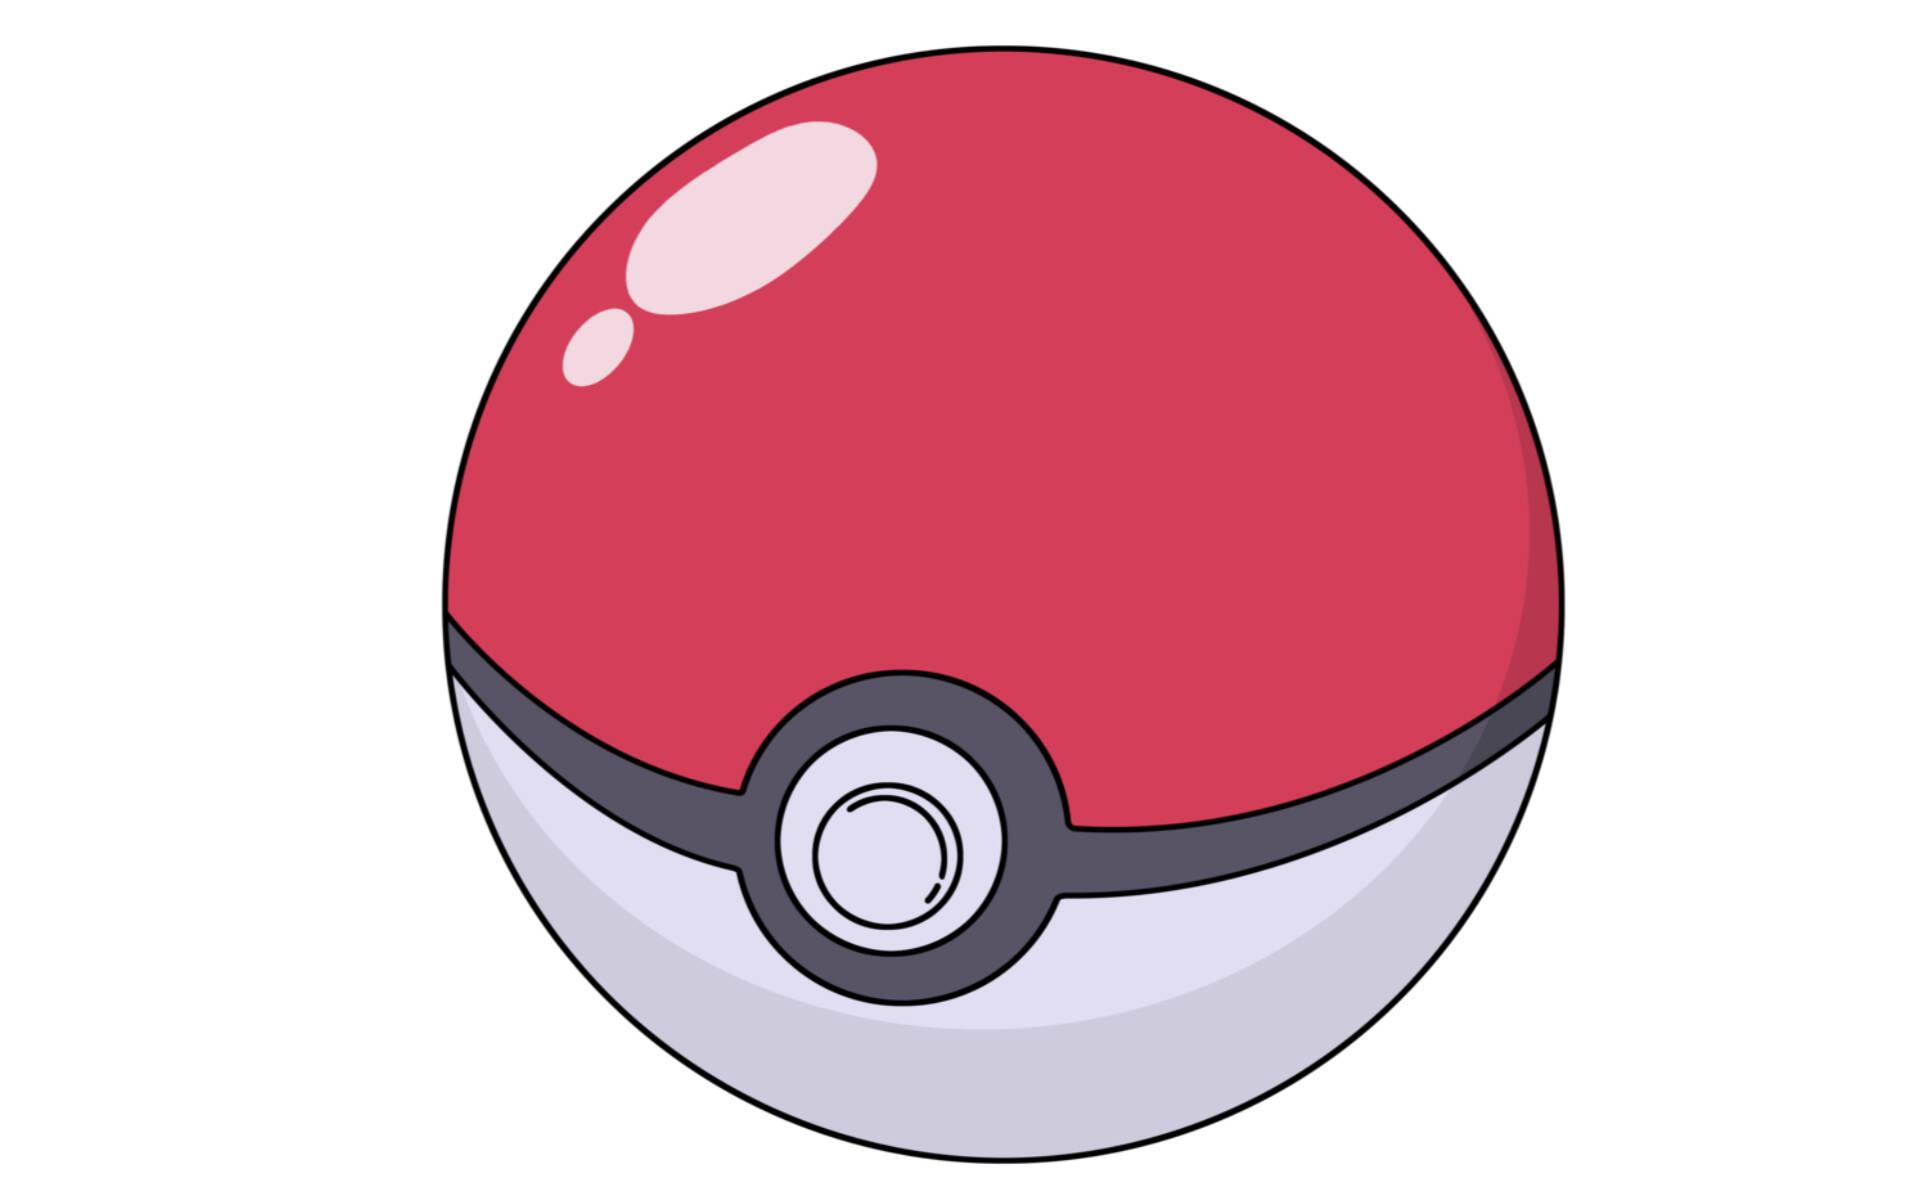 Pokè Ball Replica